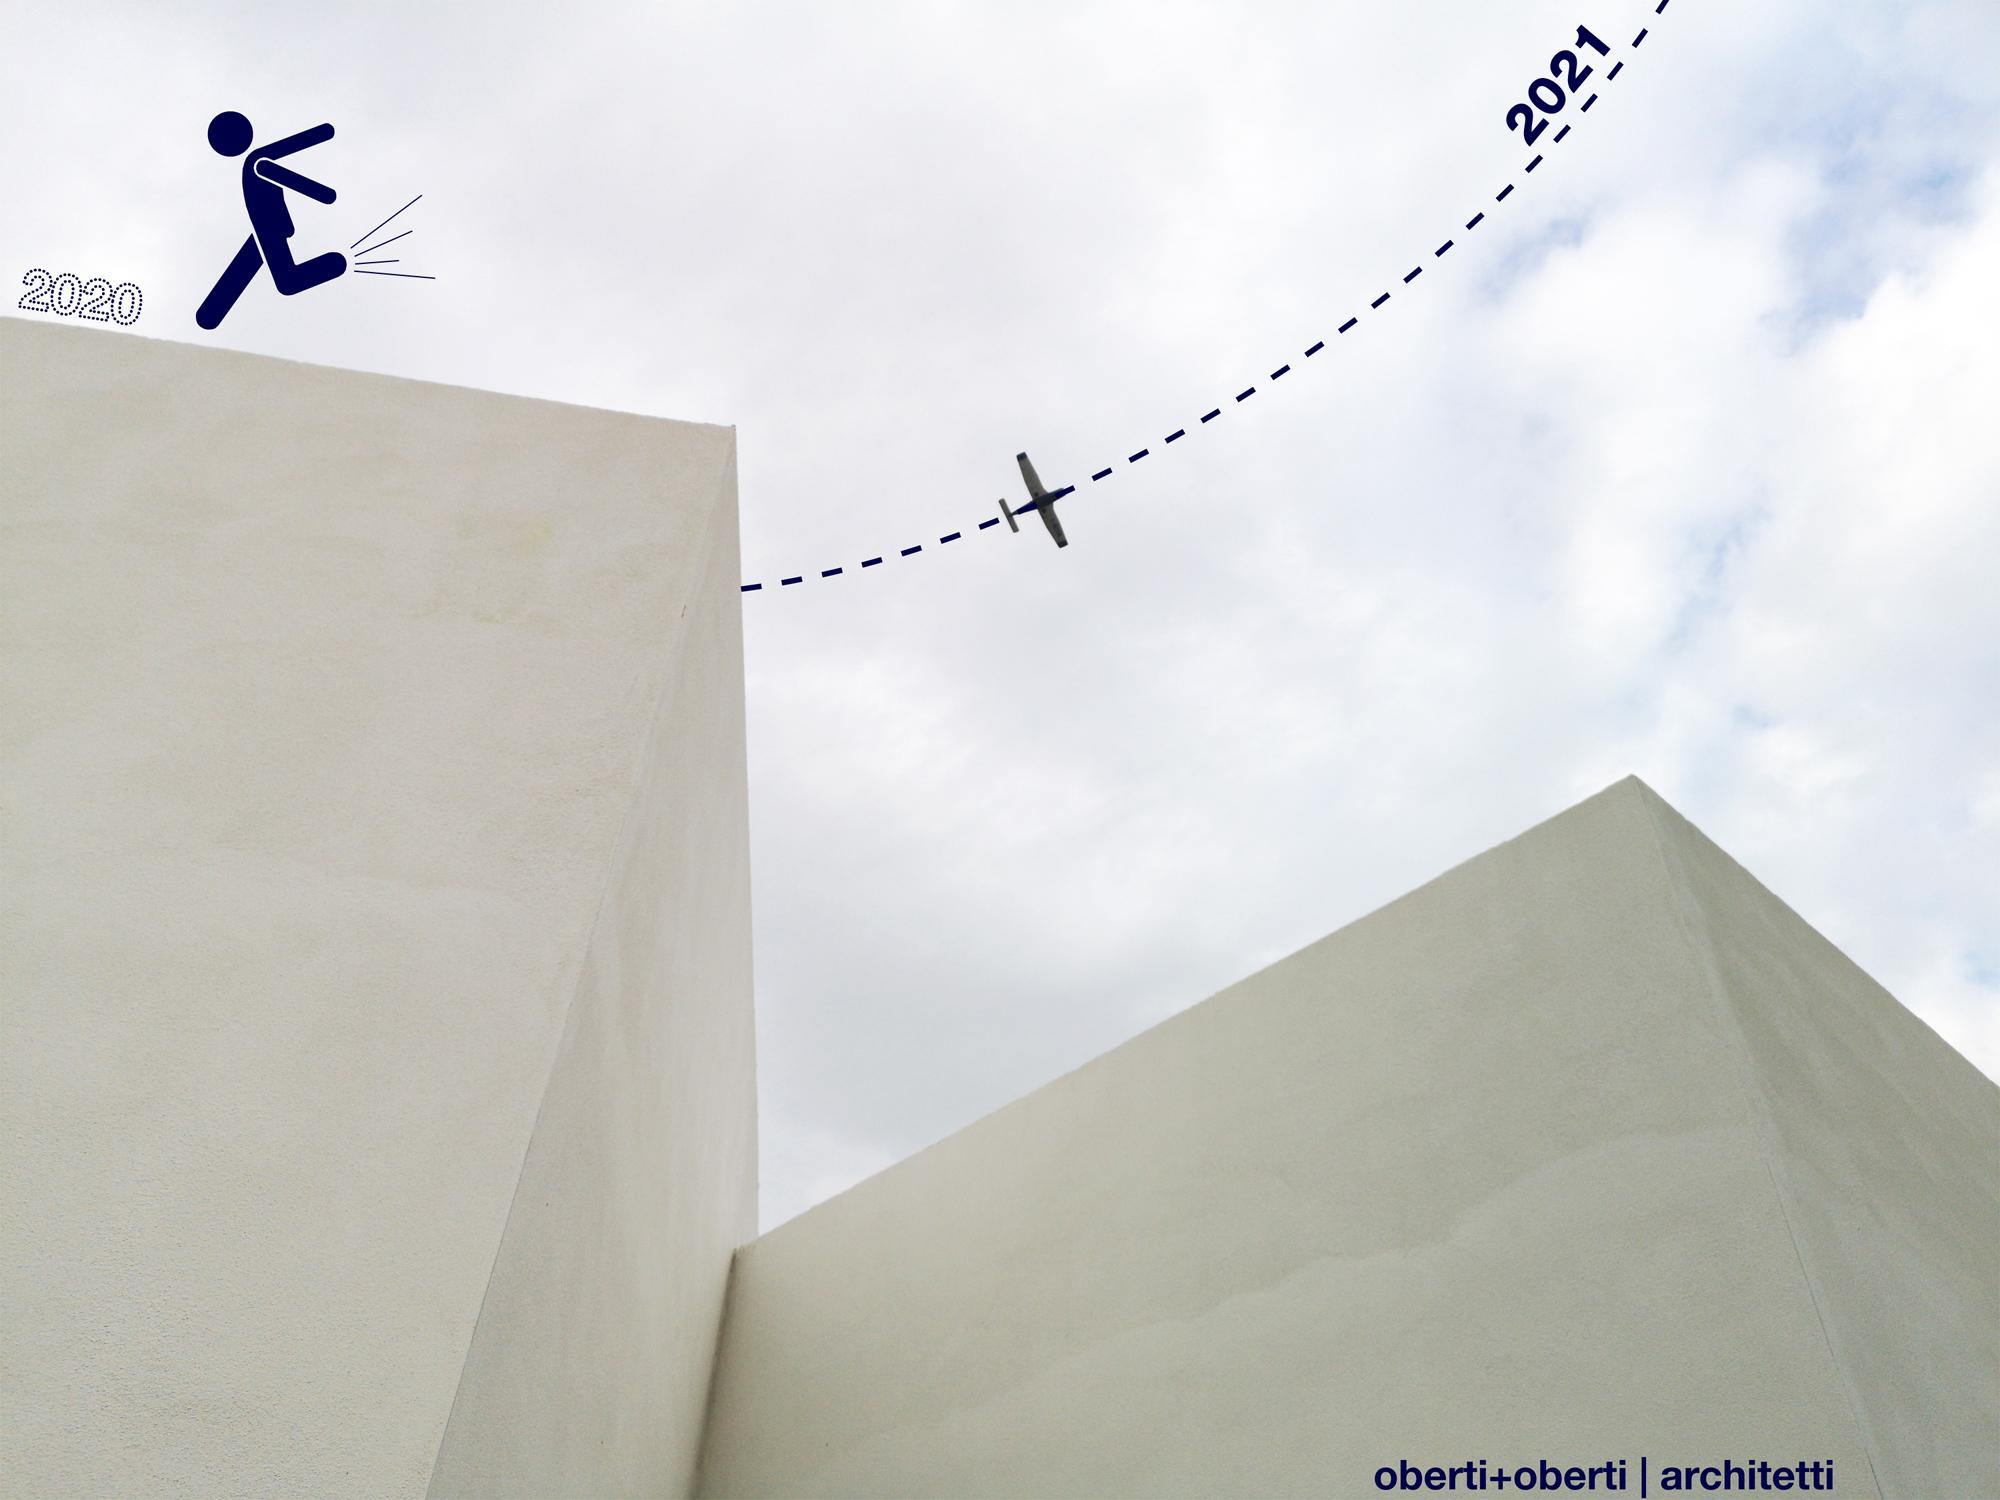 Novità - Auguri 2020 - oberti+oberti | architetti